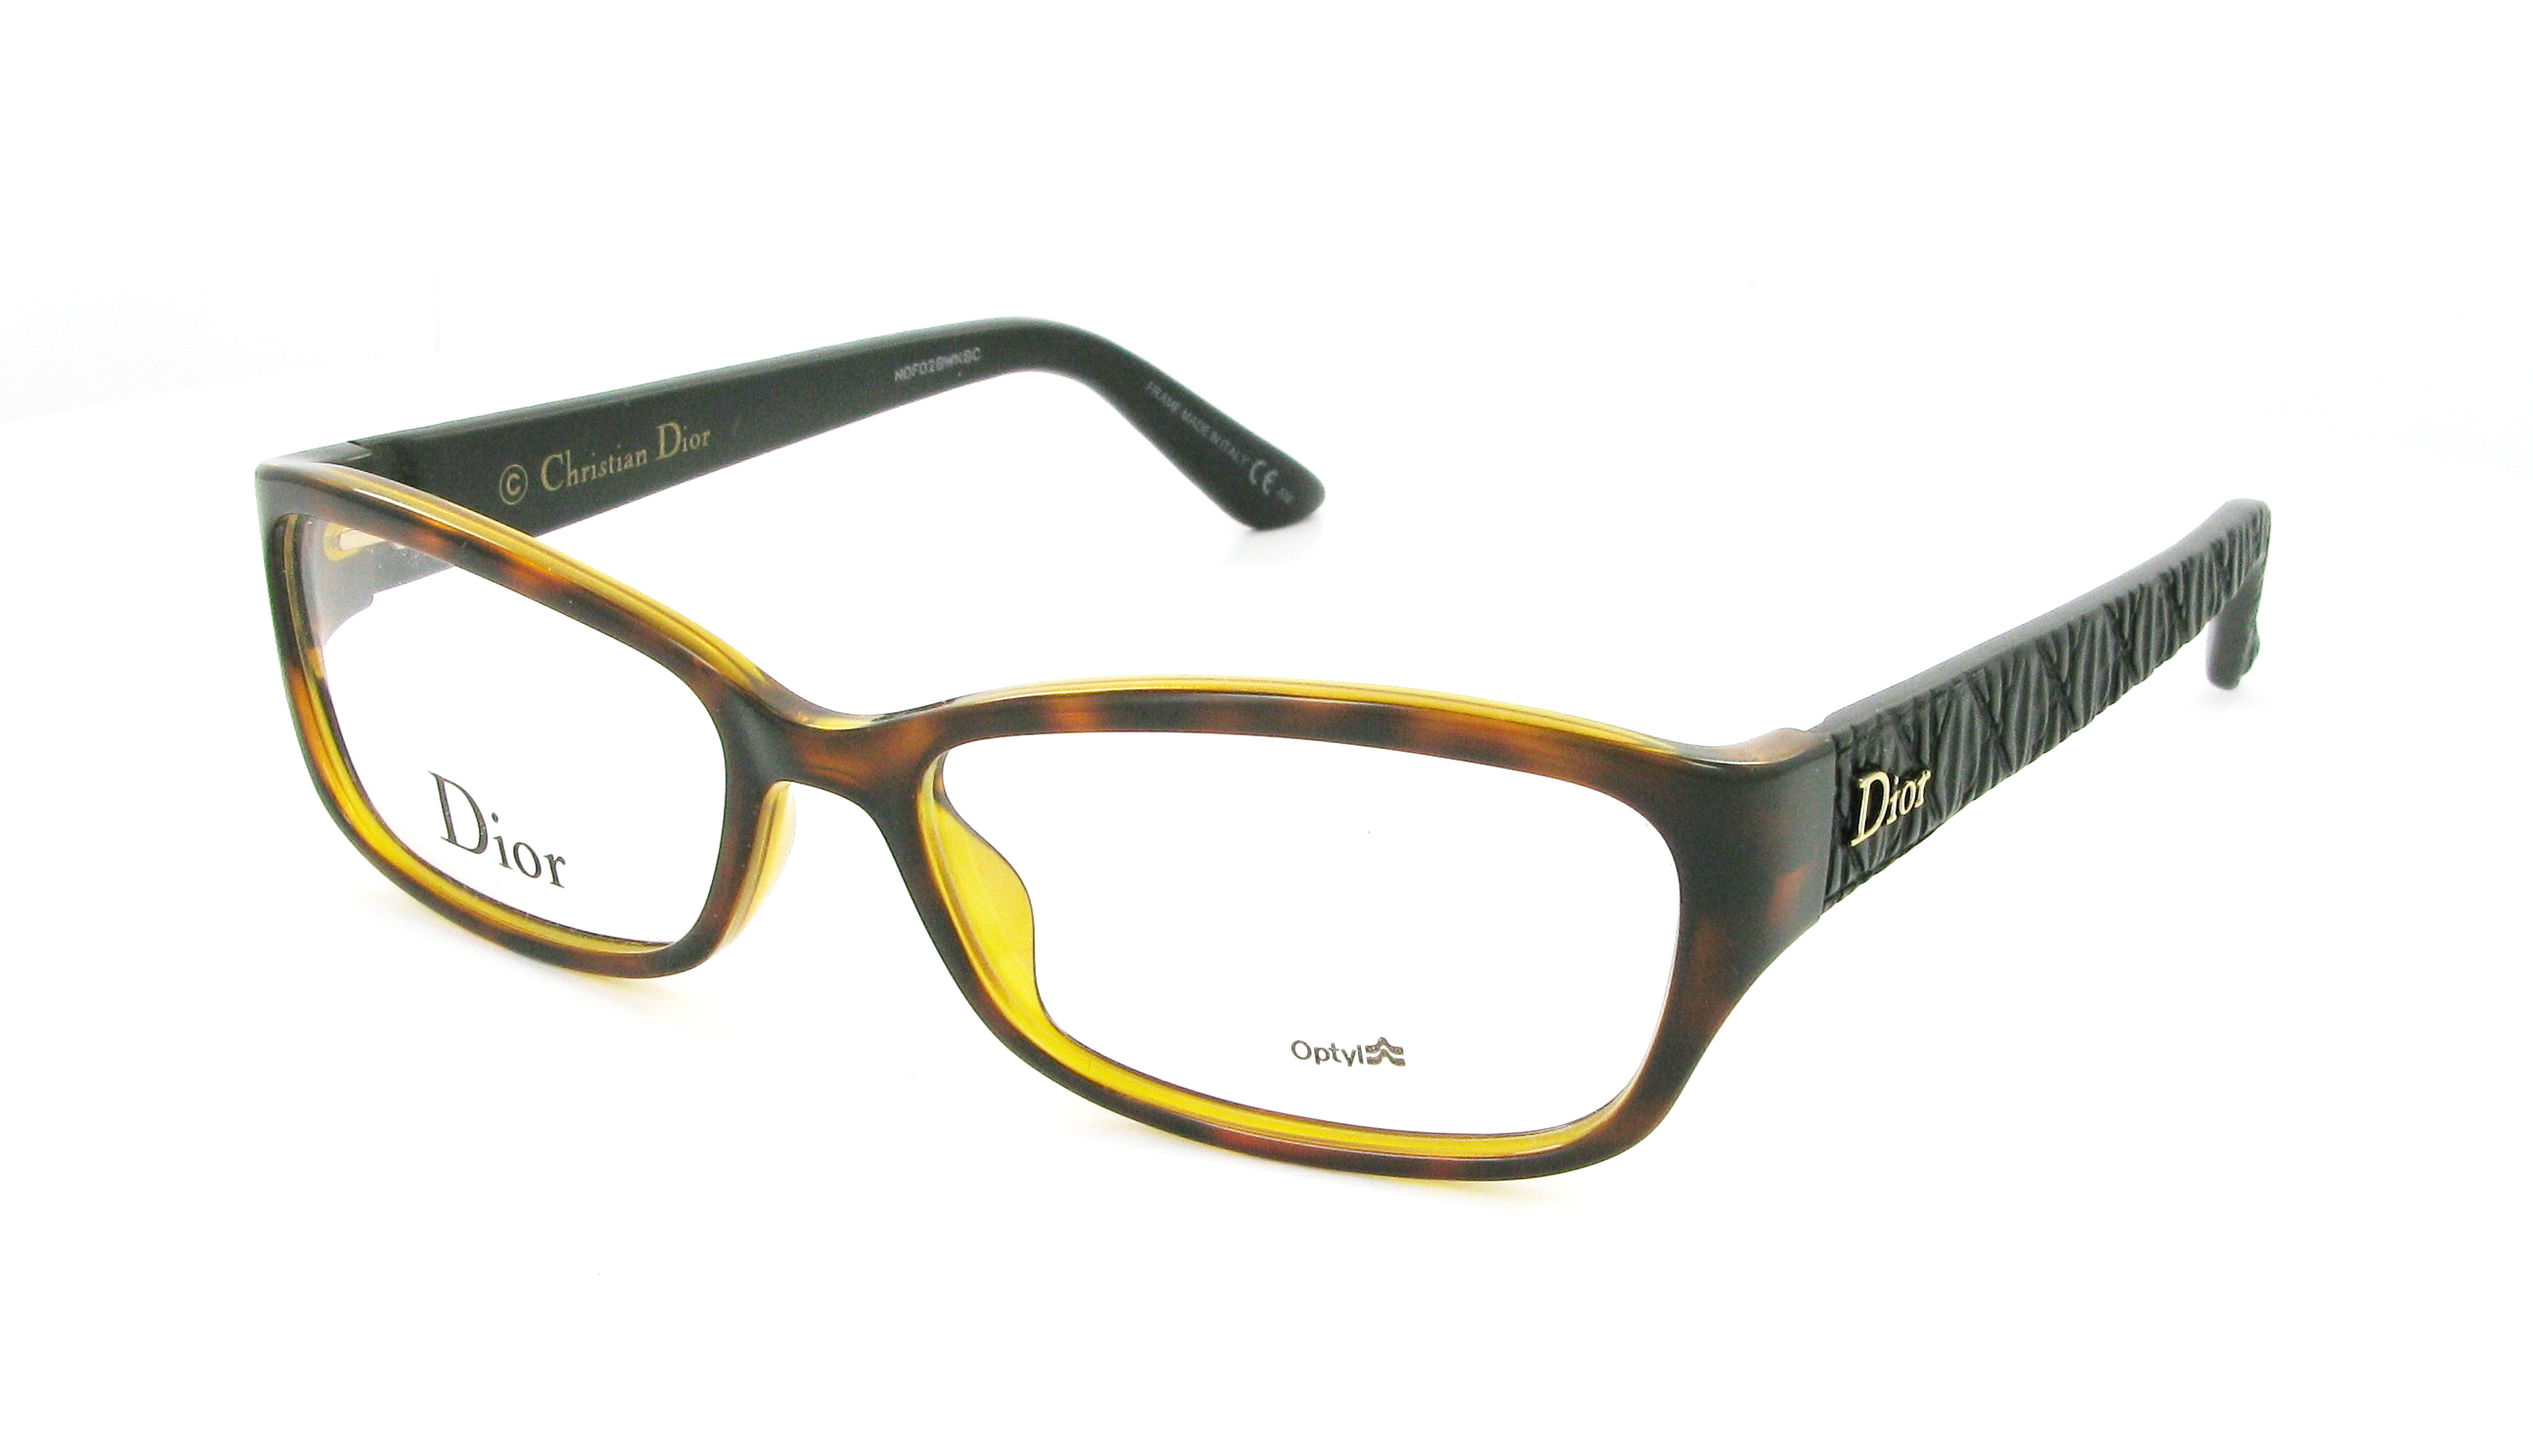 Glasses Frame Dior : Eyeglasses DIOR CD 3235 DJS 55/16 Woman Ecaille rectangle ...